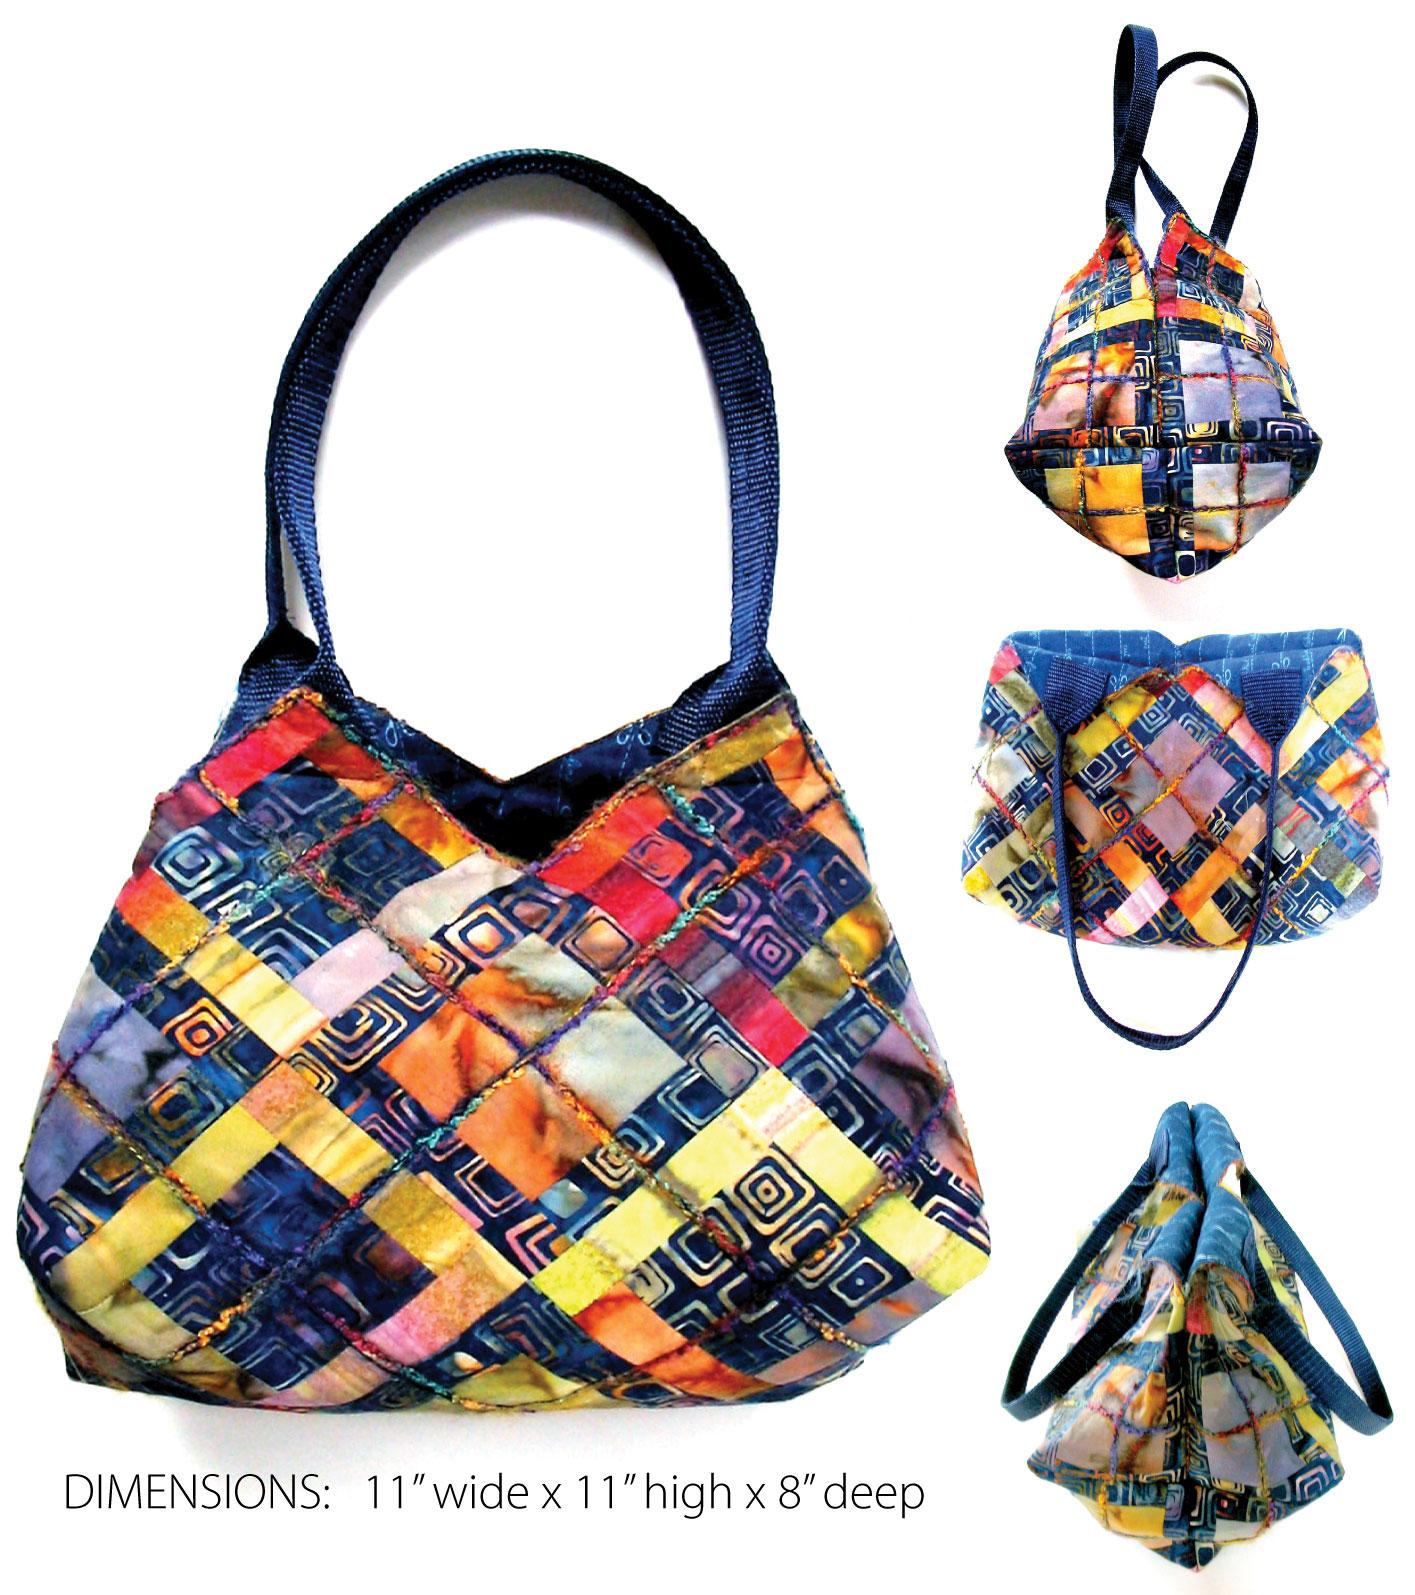 Unique Shaped Handbags This Uniquely Shaped Handbag